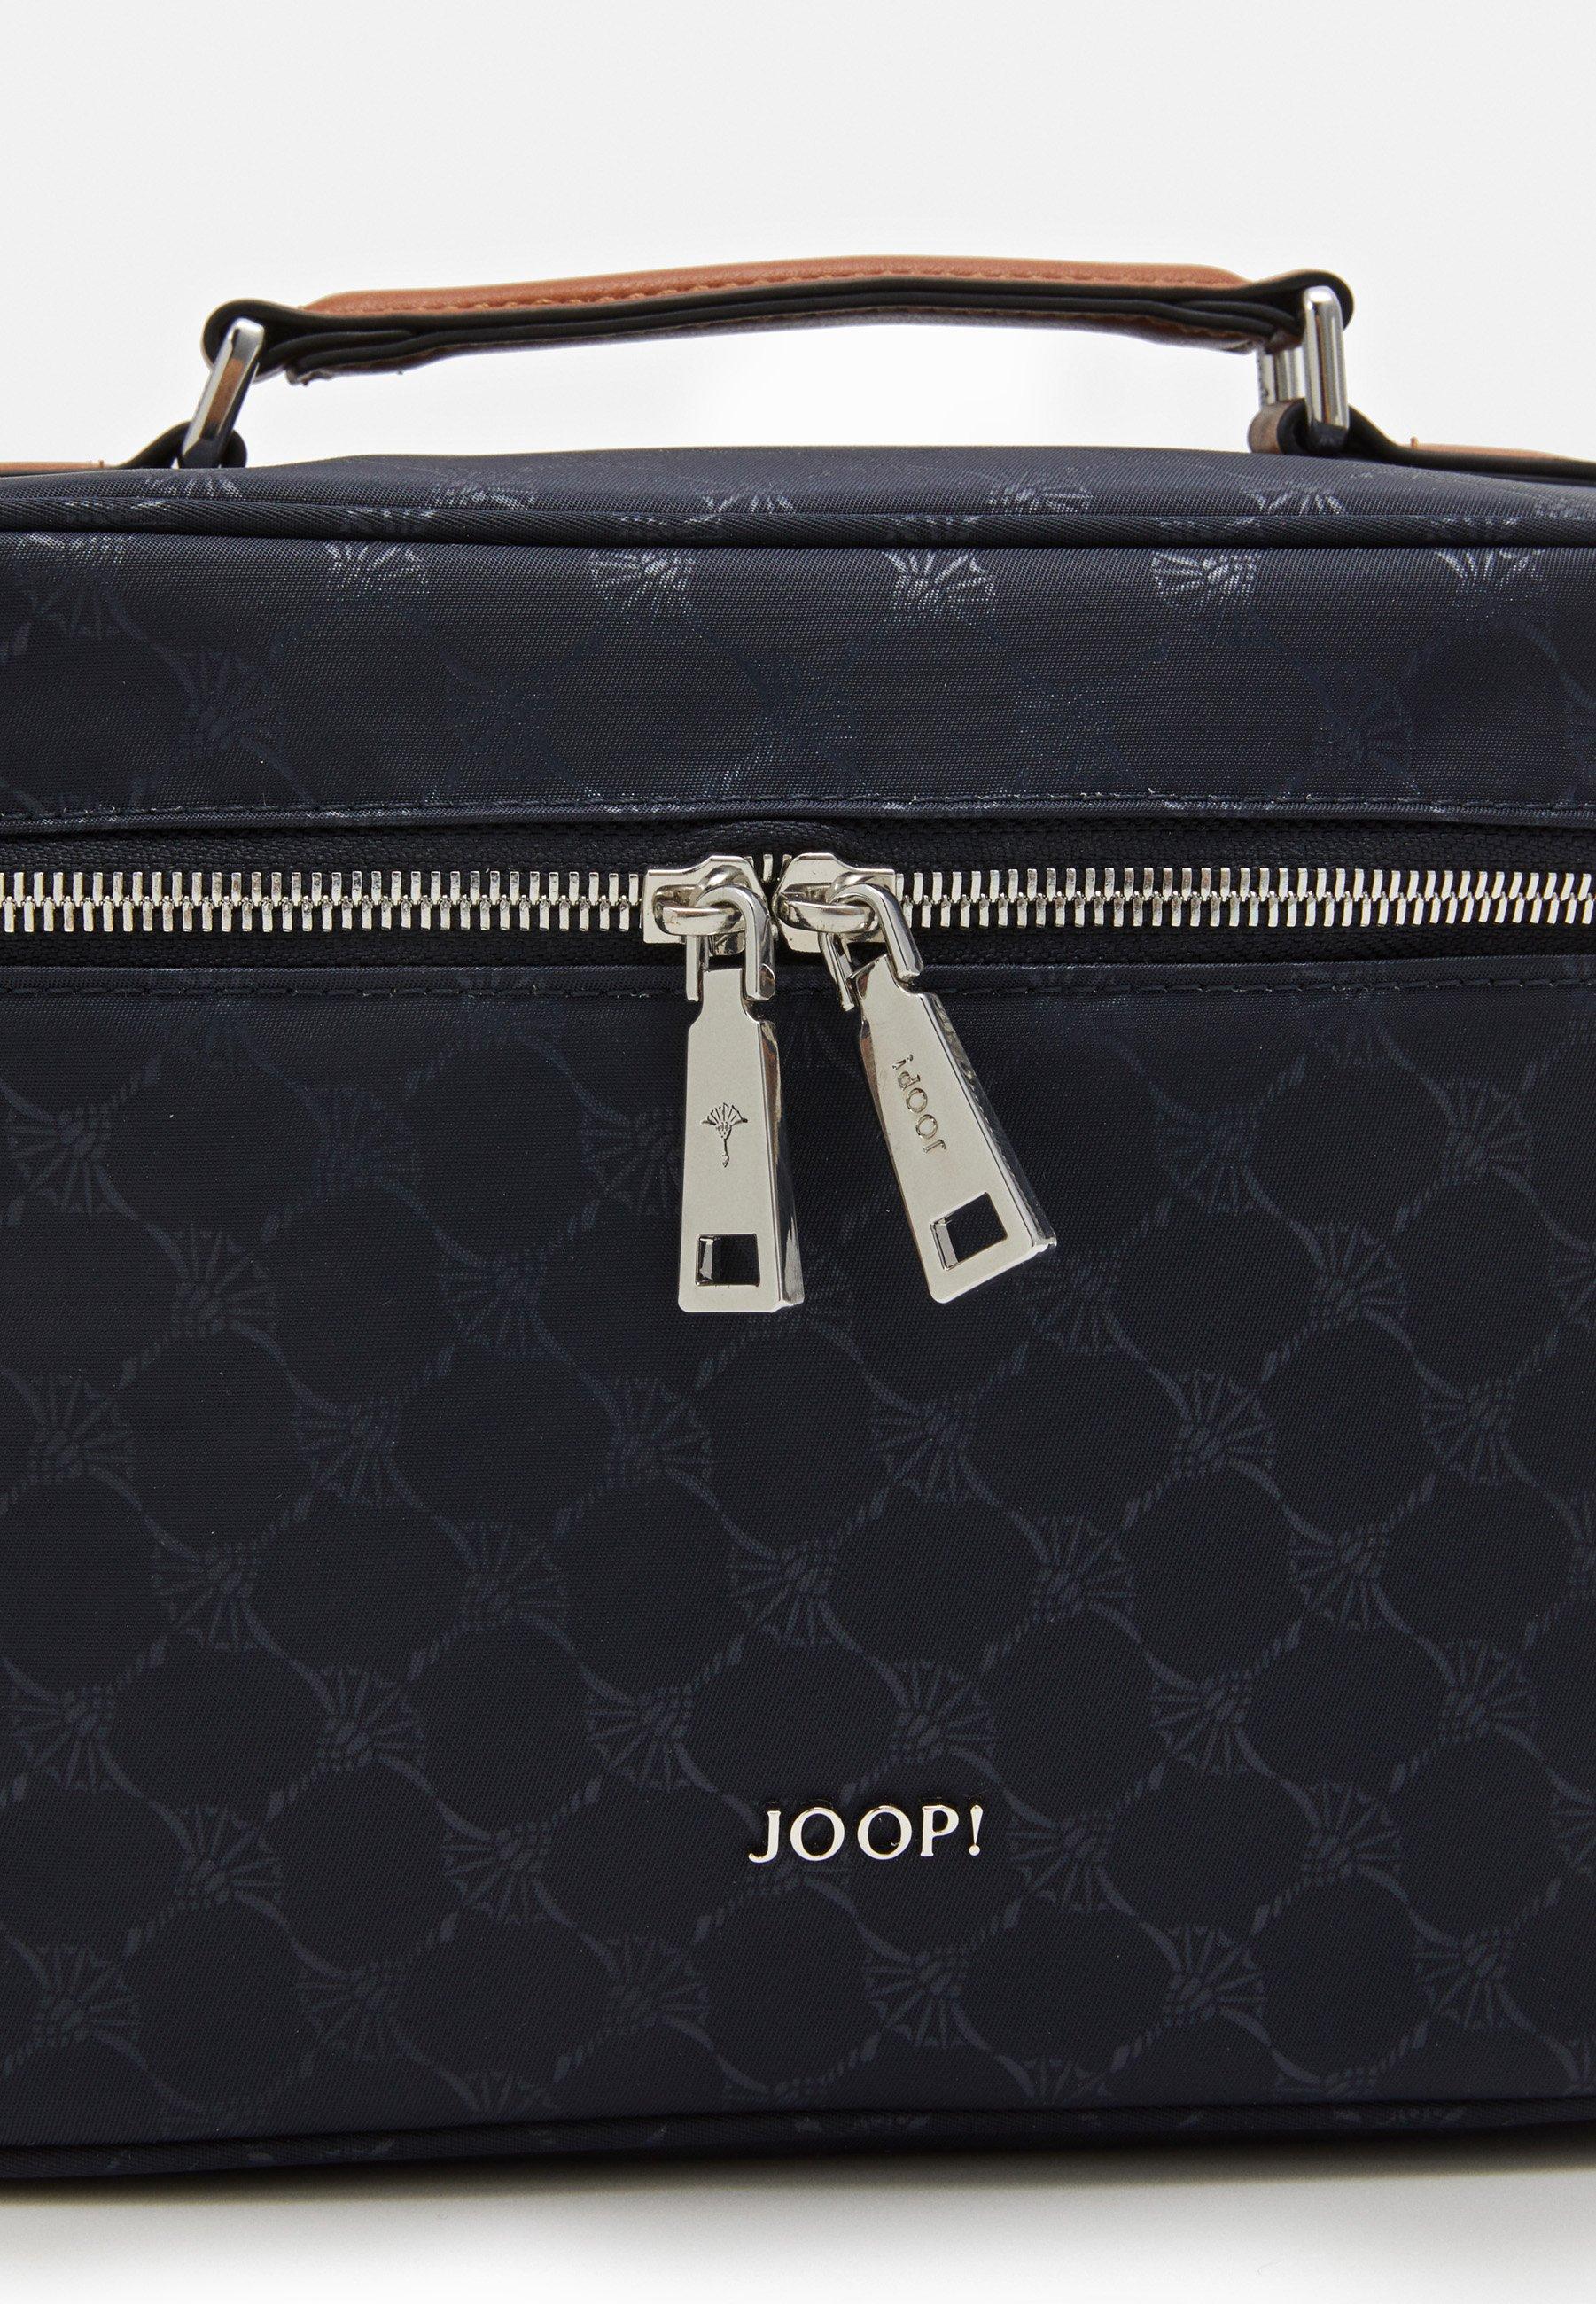 JOOP! CORNFLOWER FLORA - Kosmetiktasche - Toalettmappe - nightblue/mørkeblå lANqRGEpZbyM671